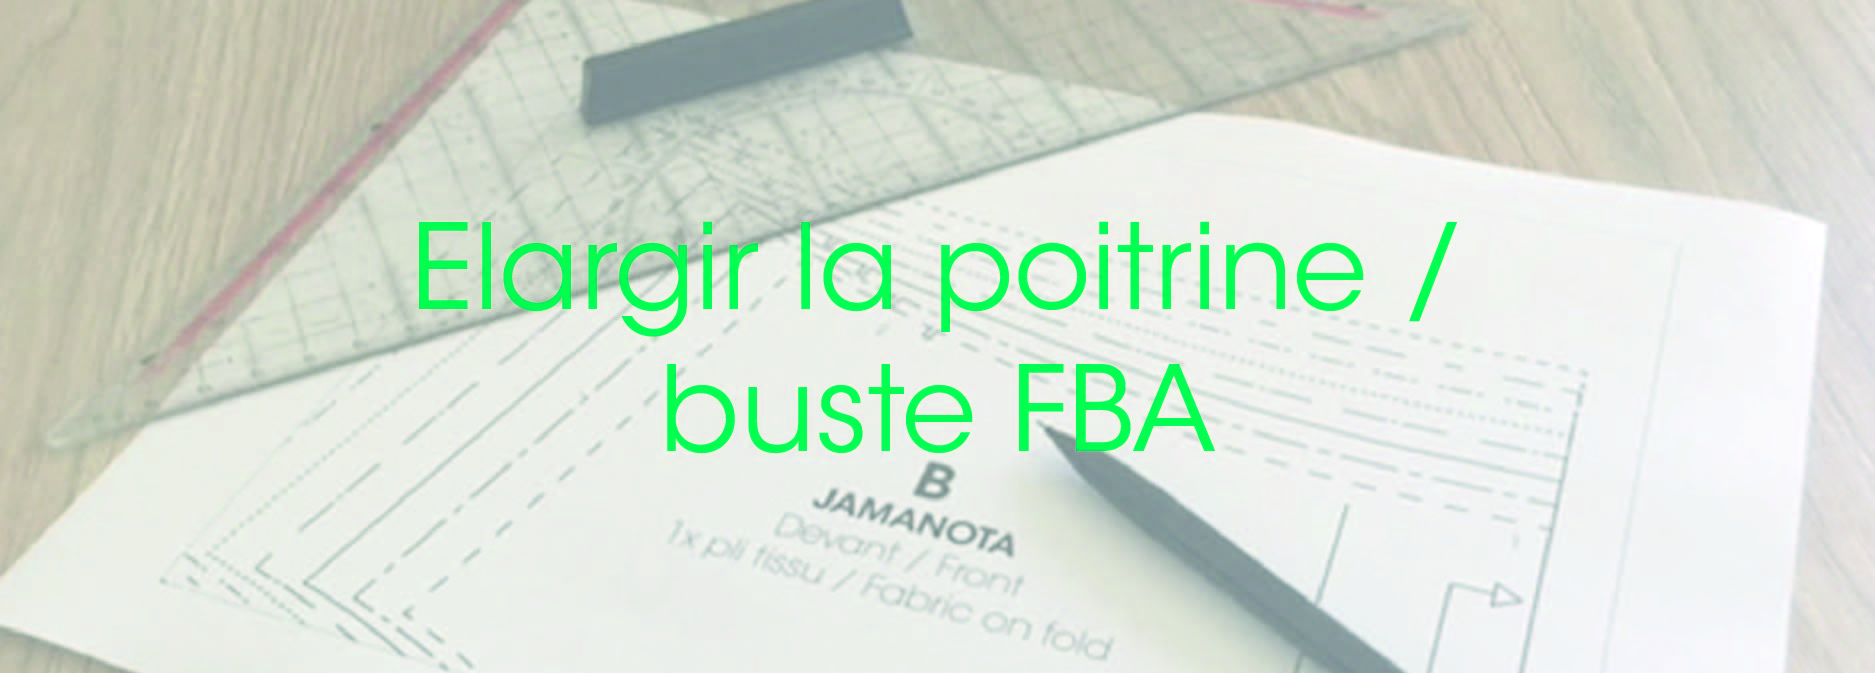 Modélisme_Comment_élargir_la_poitrine_buste_FBA